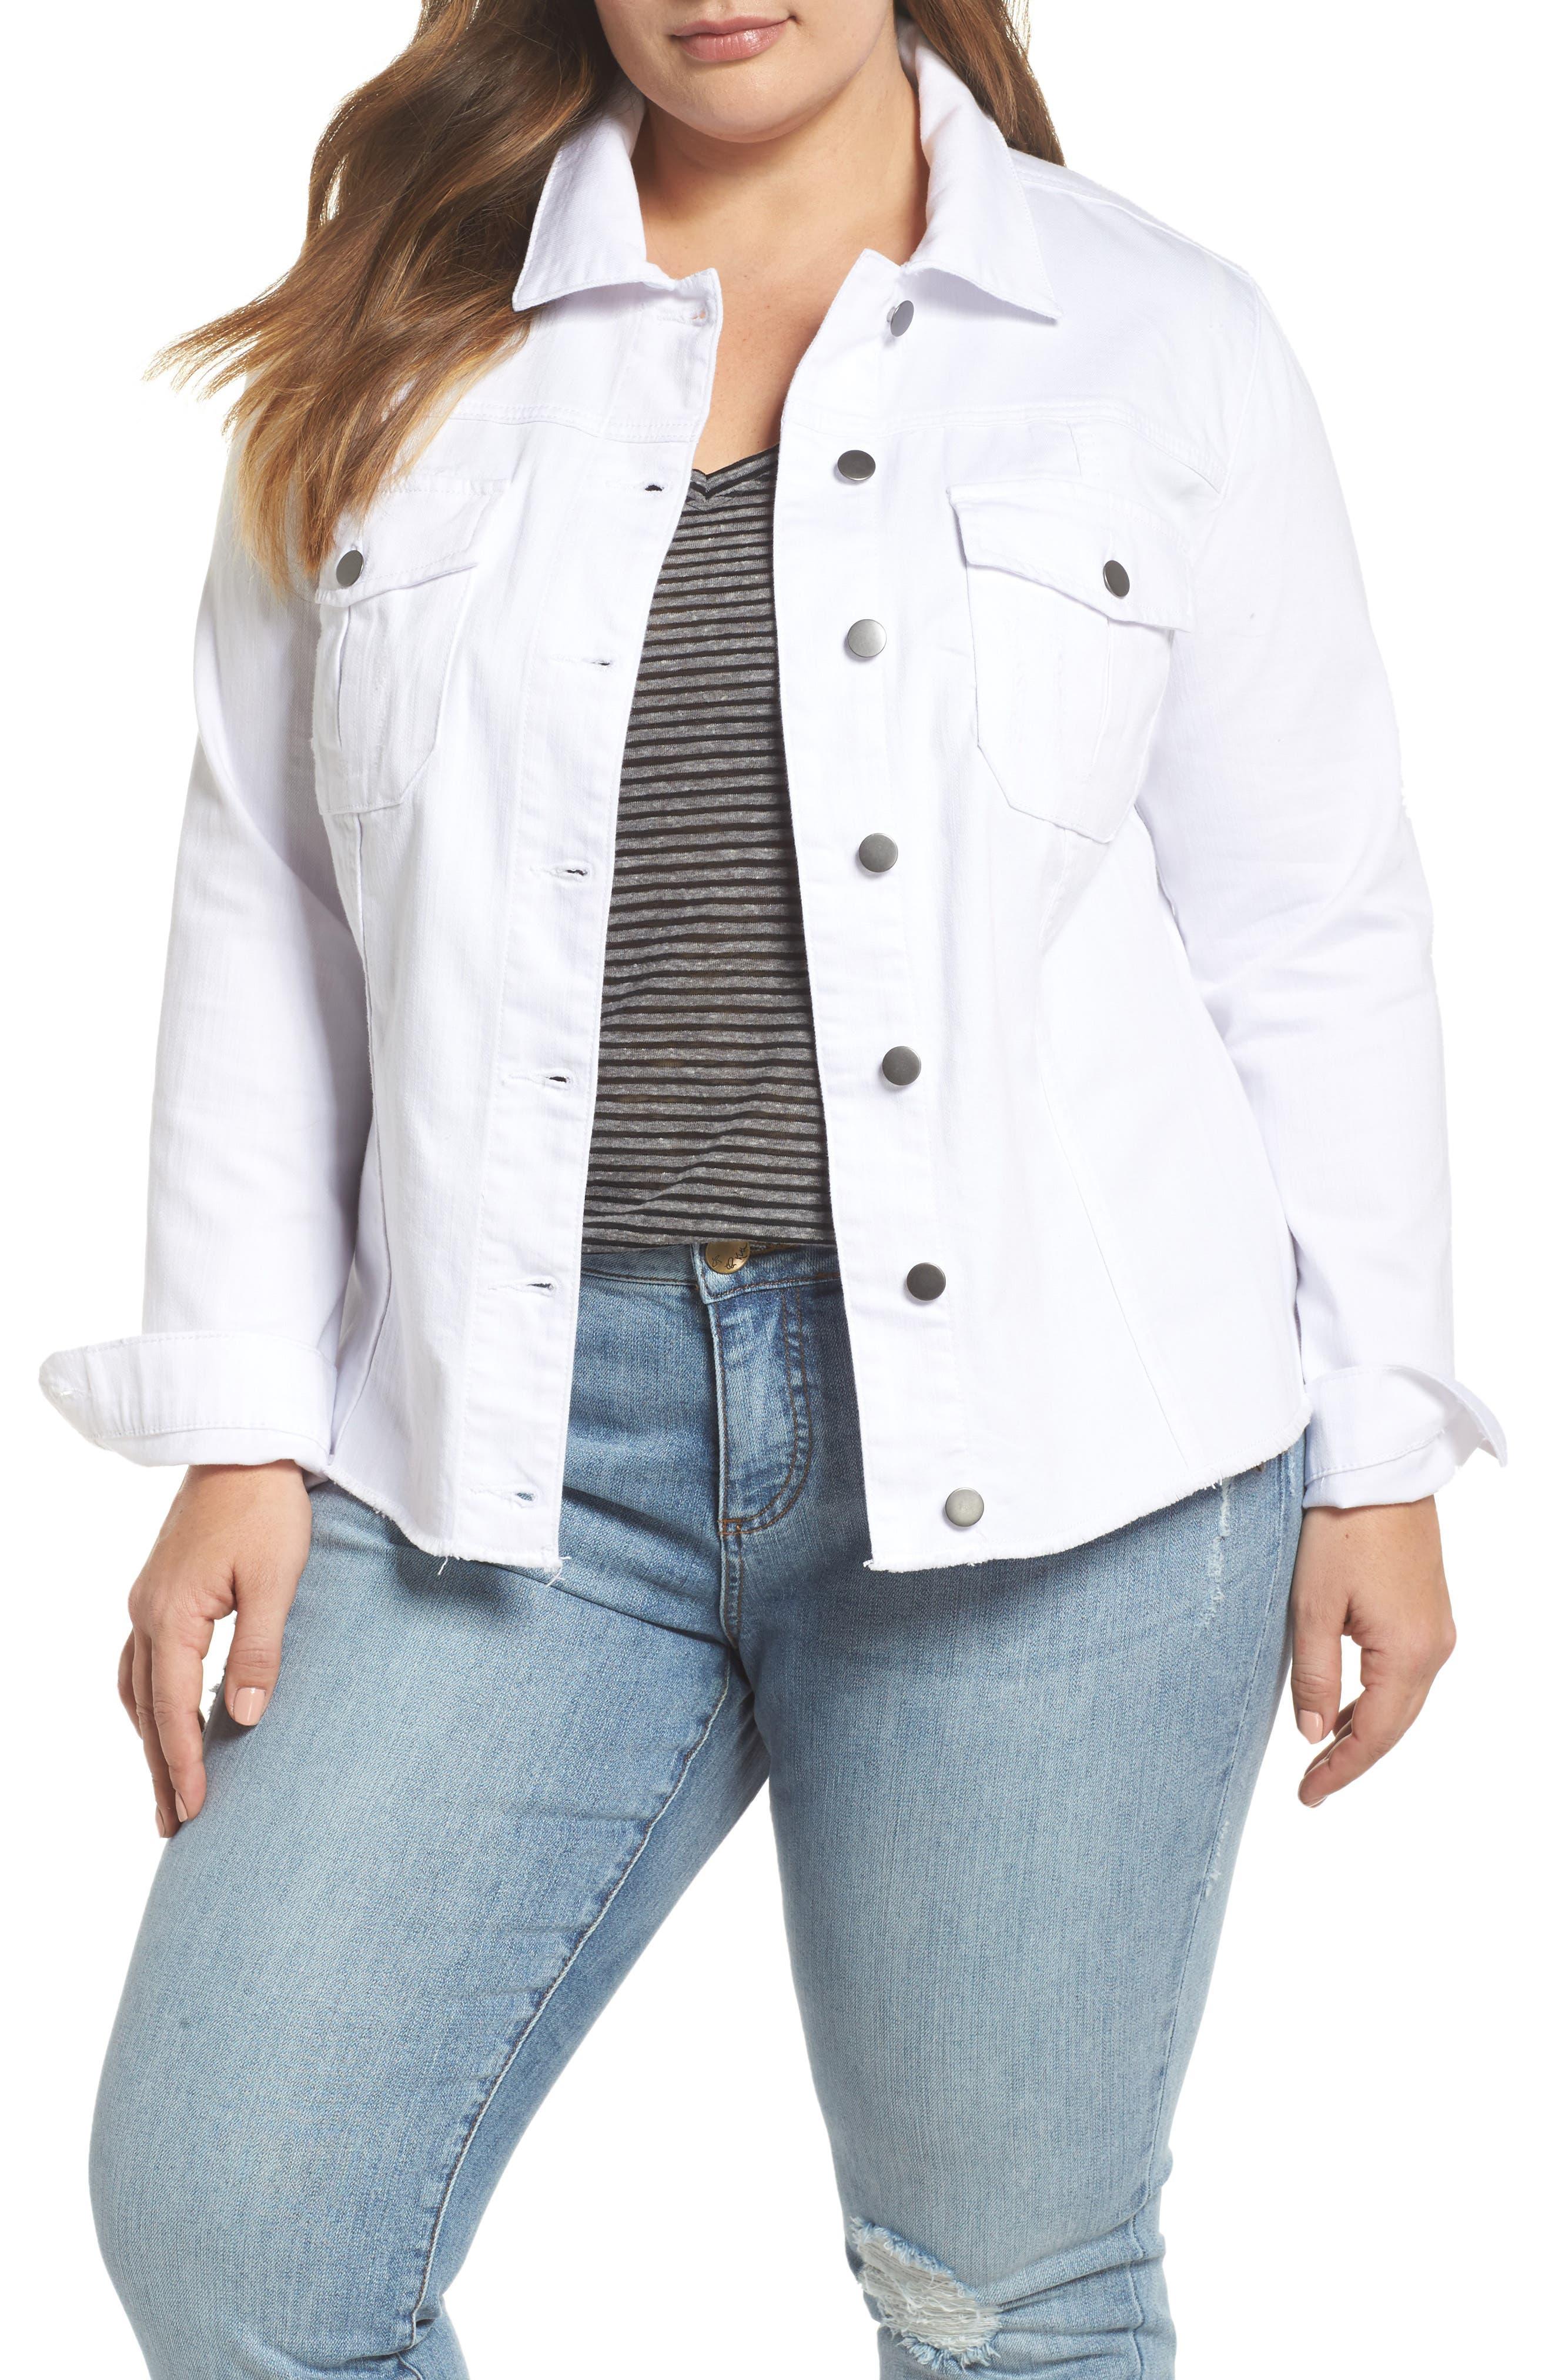 Kara Denim Jacket,                             Main thumbnail 1, color,                             Optic White